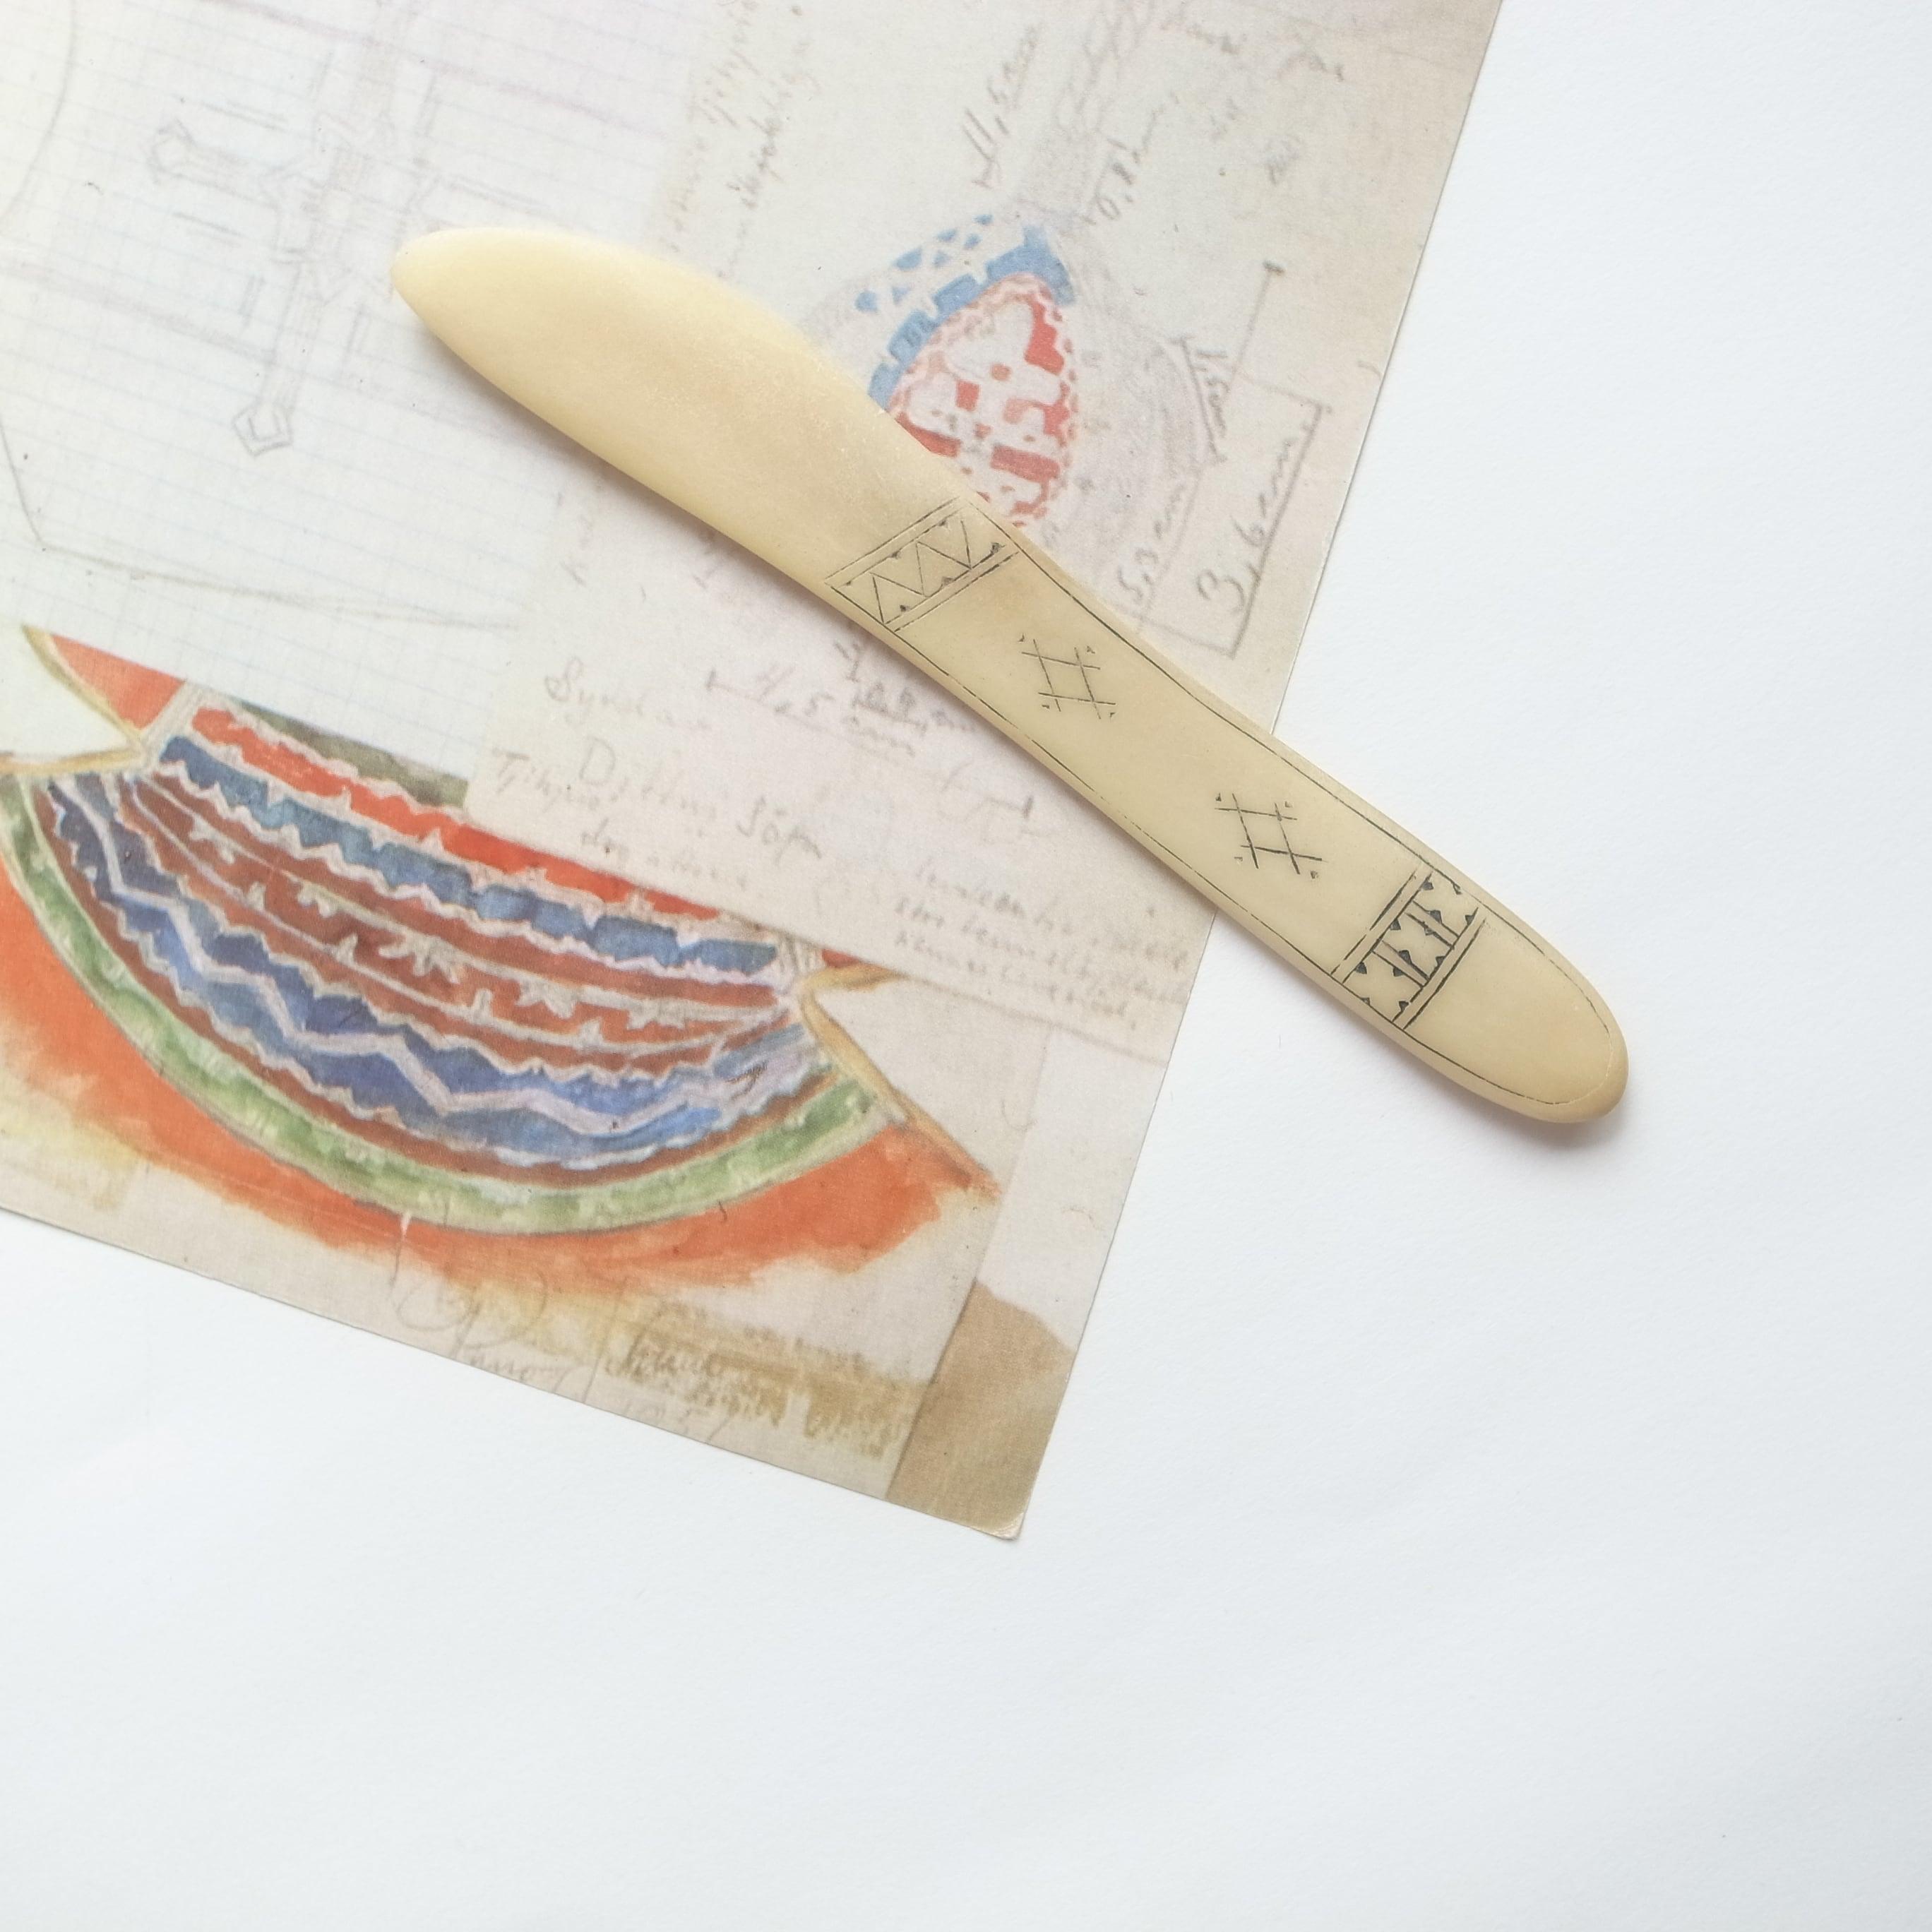 Sami paper knife